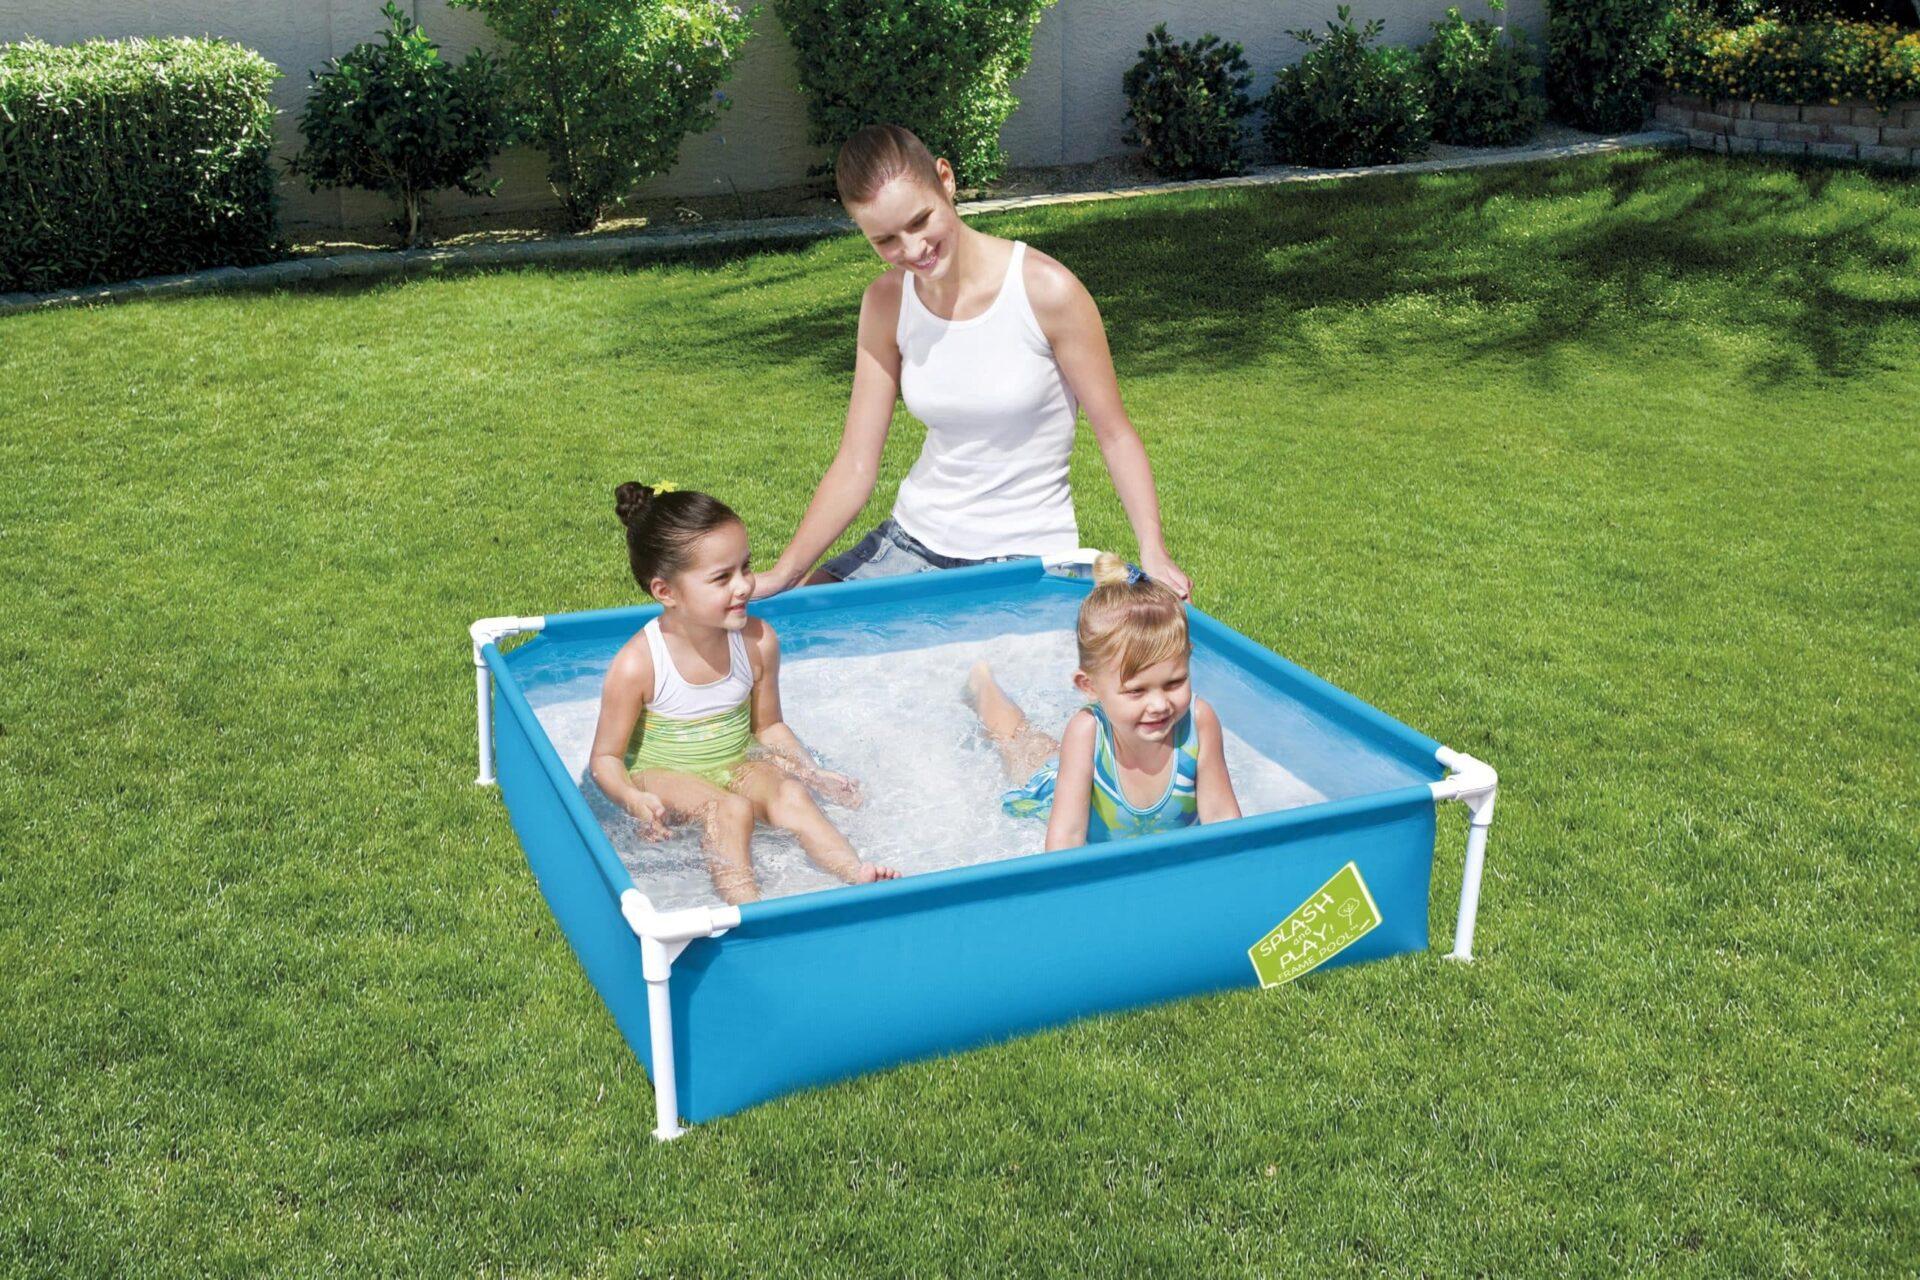 Firkantet Bestway barnebasseng barn svømming